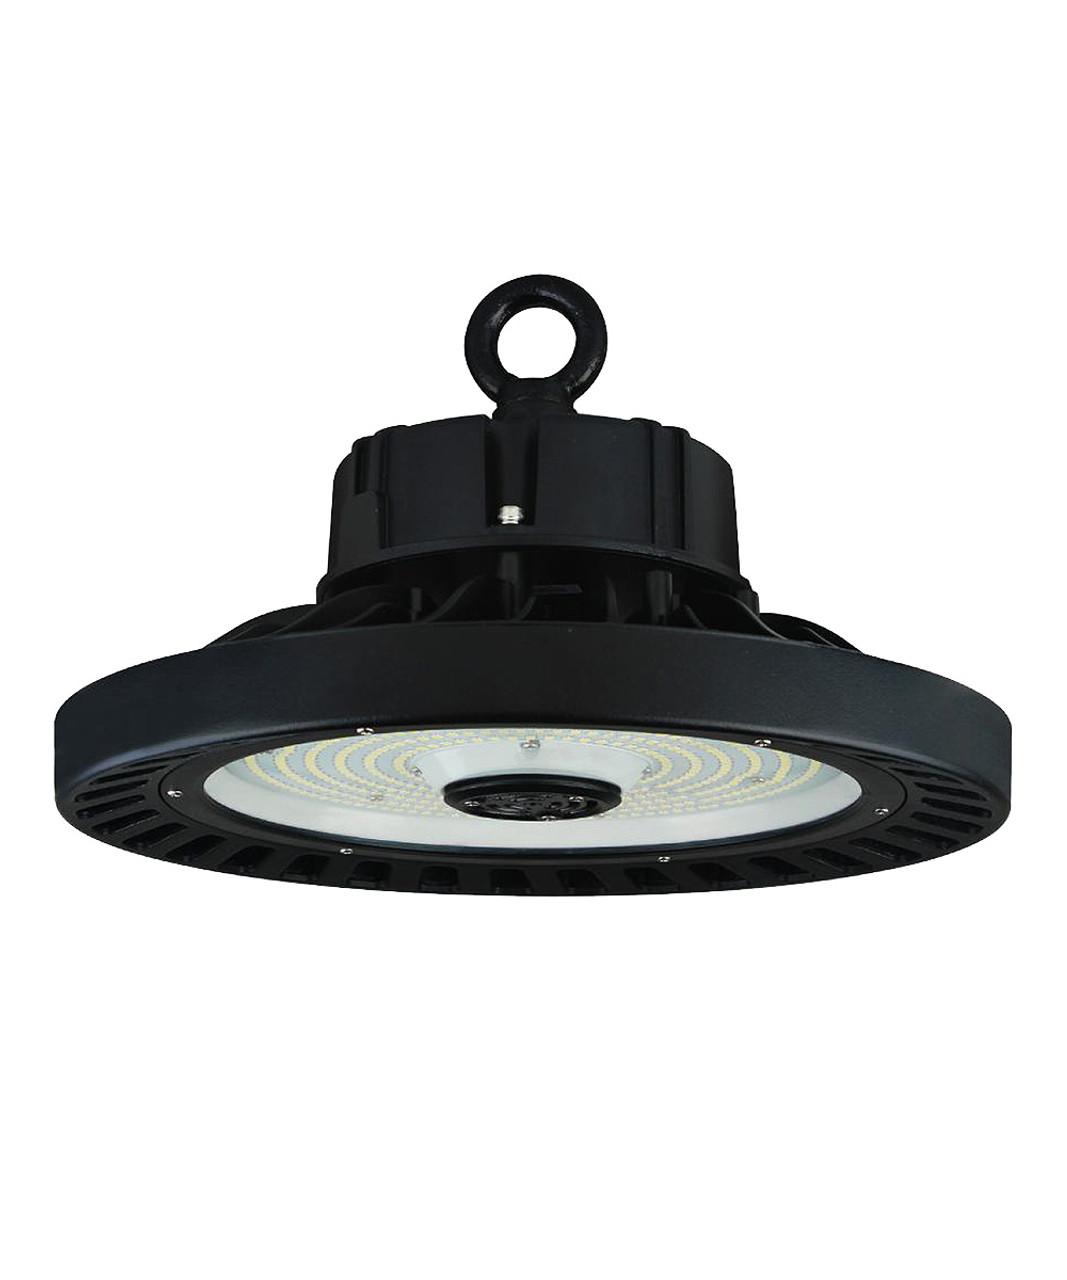 150 Watt LED High Bay FHUE Series